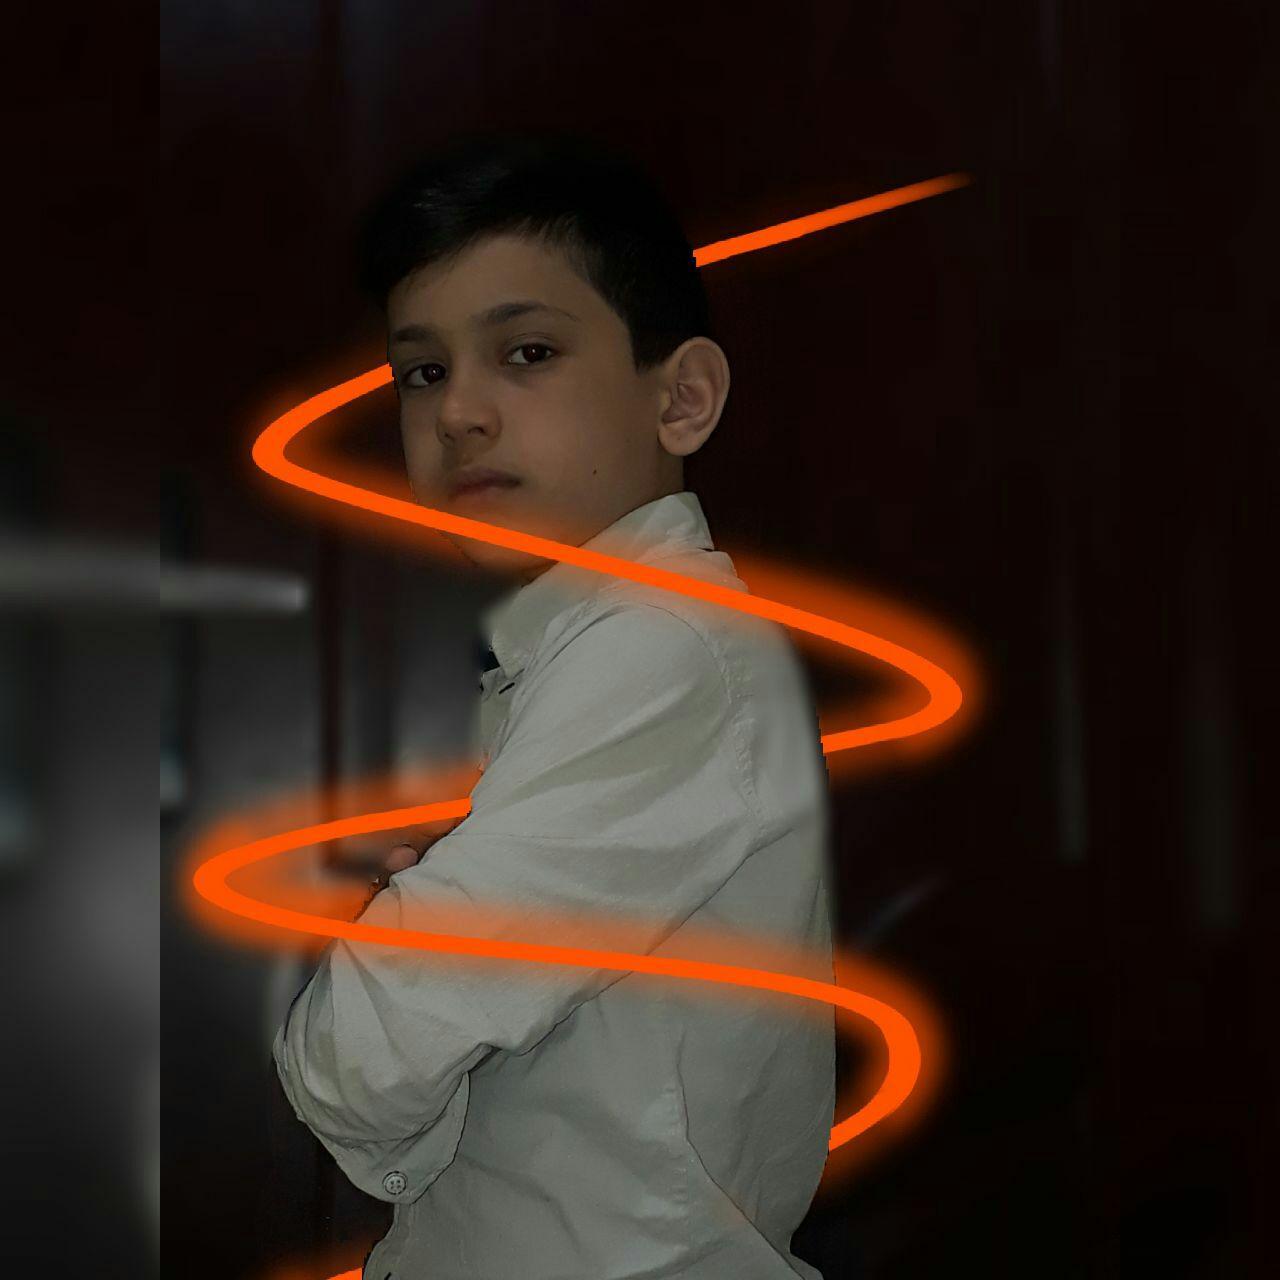 TahaZareei1399 profile picture